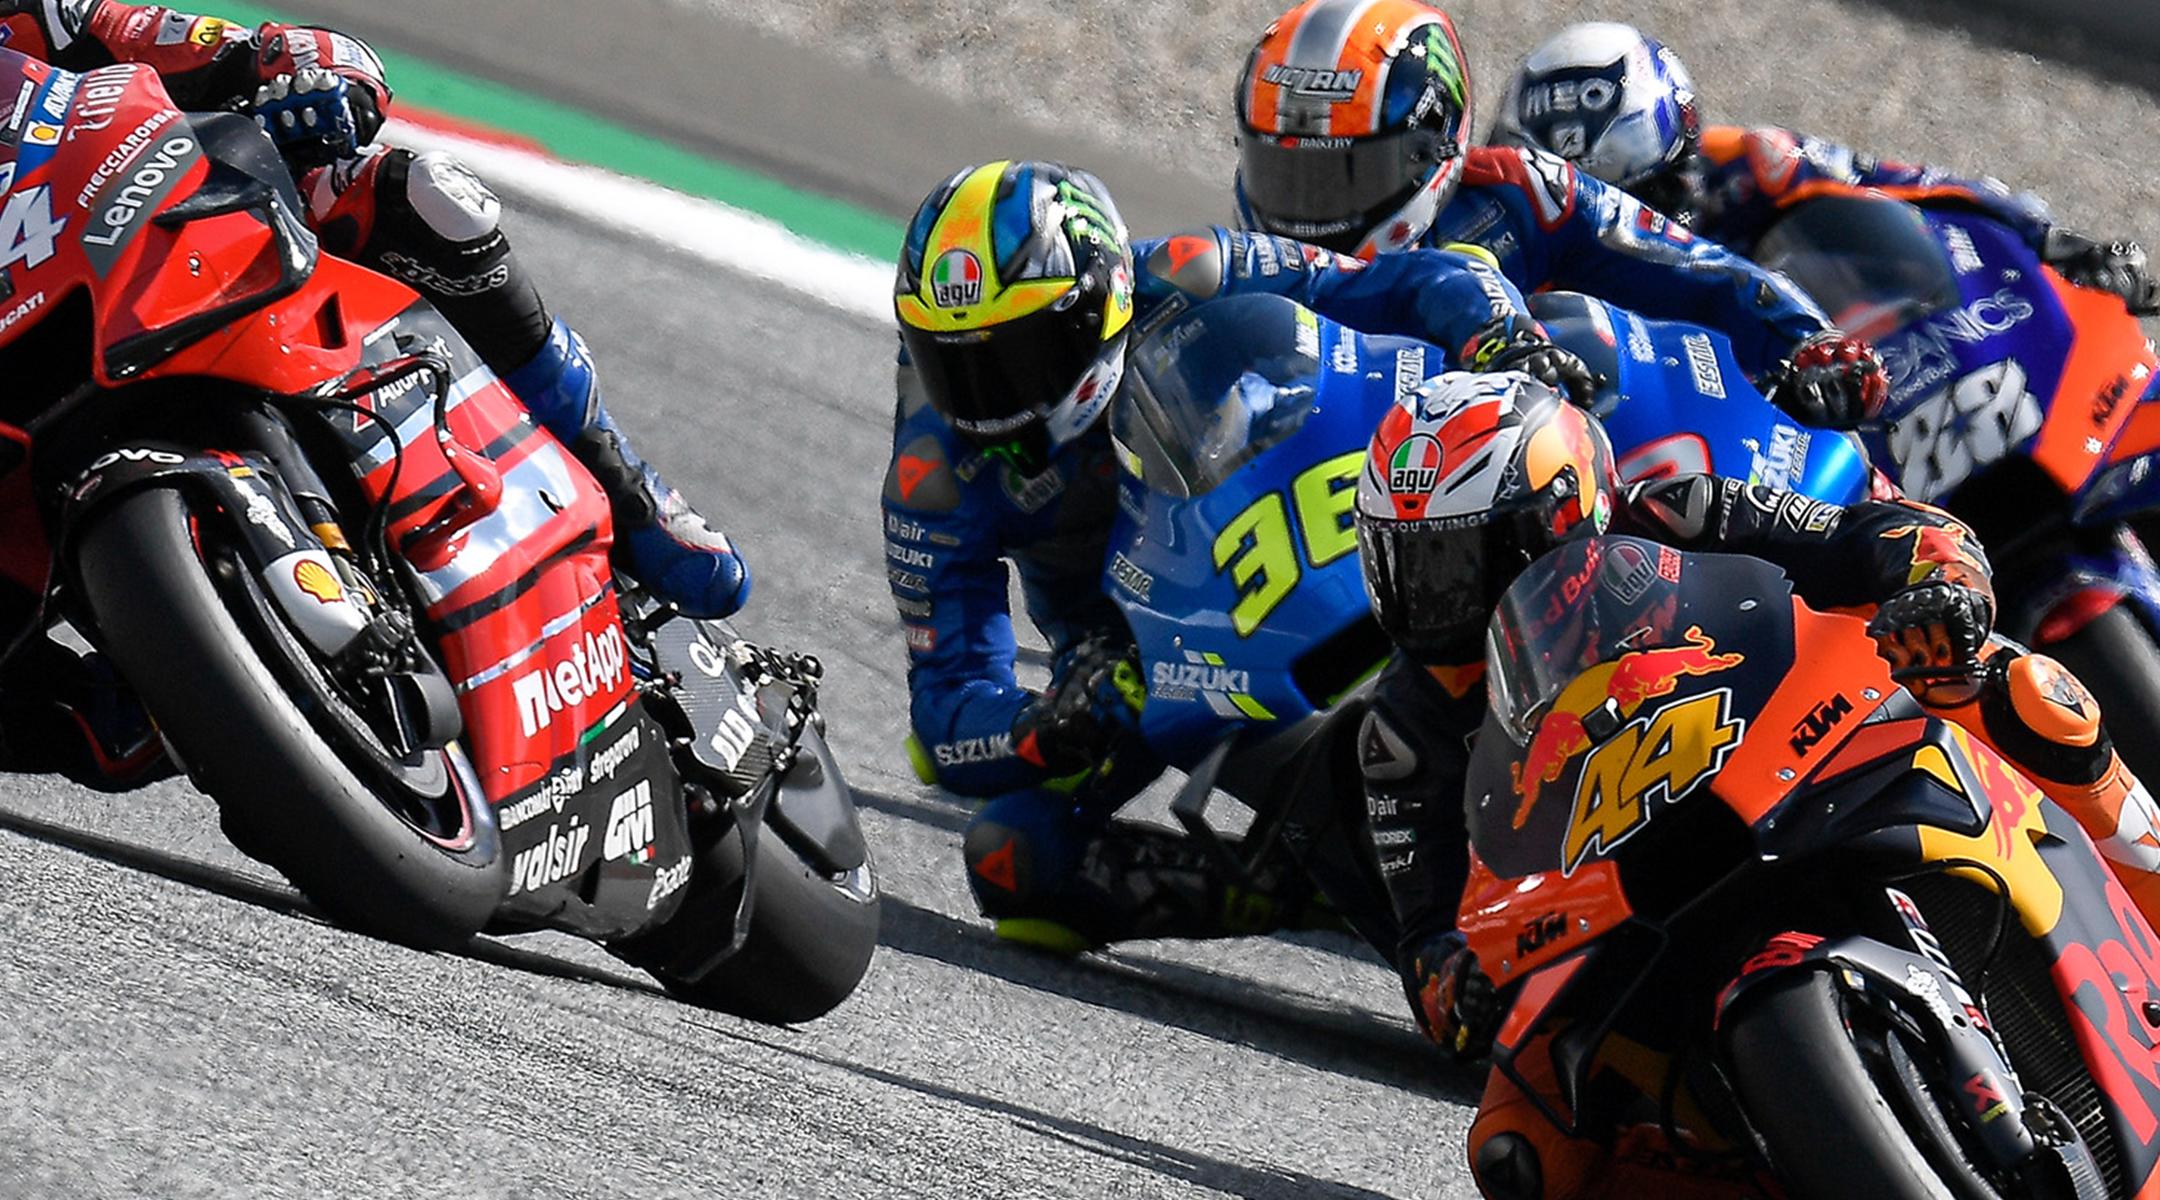 British Grand Prix MotoGP - Race Day